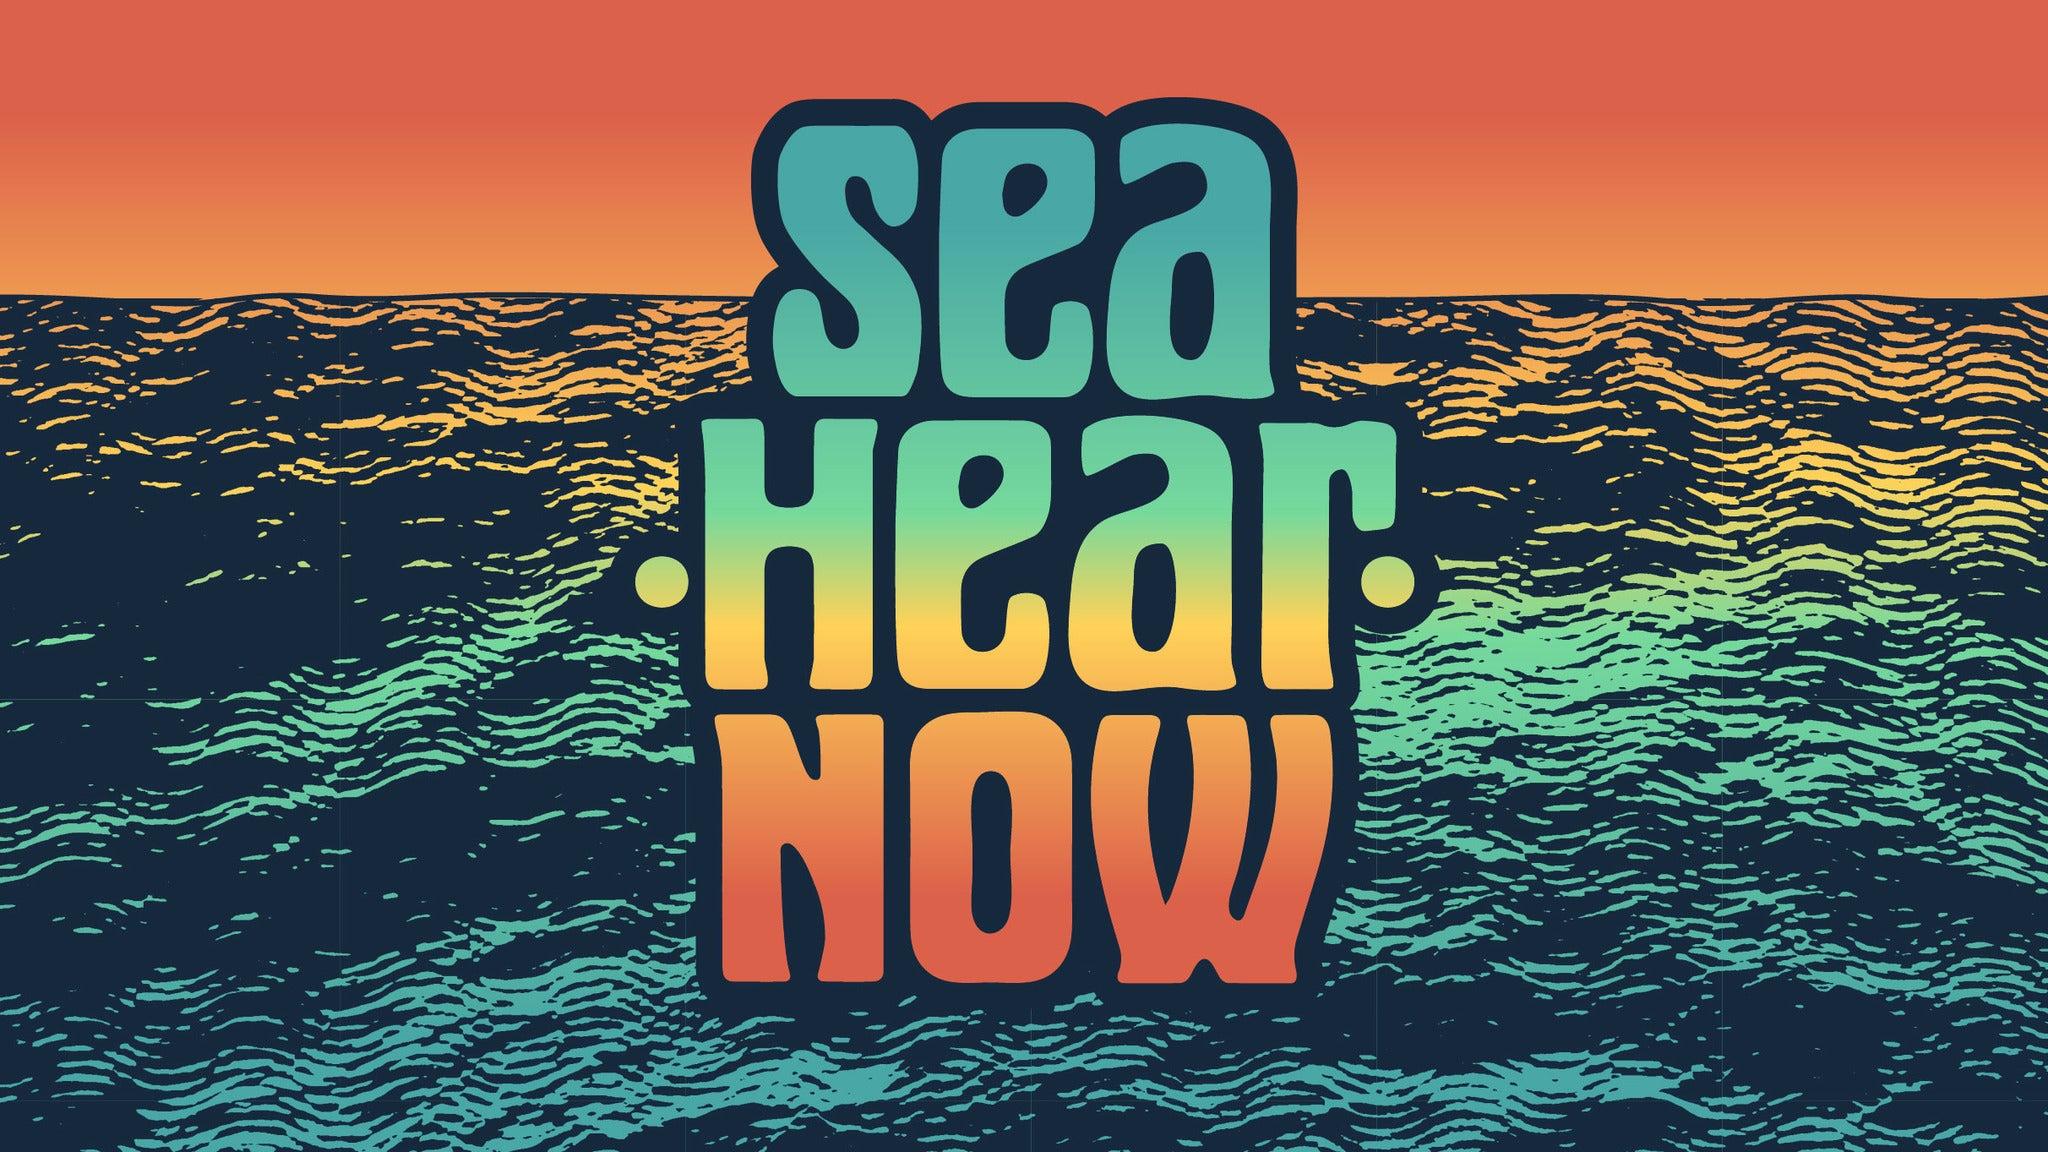 Sea.Hear.Now Festival